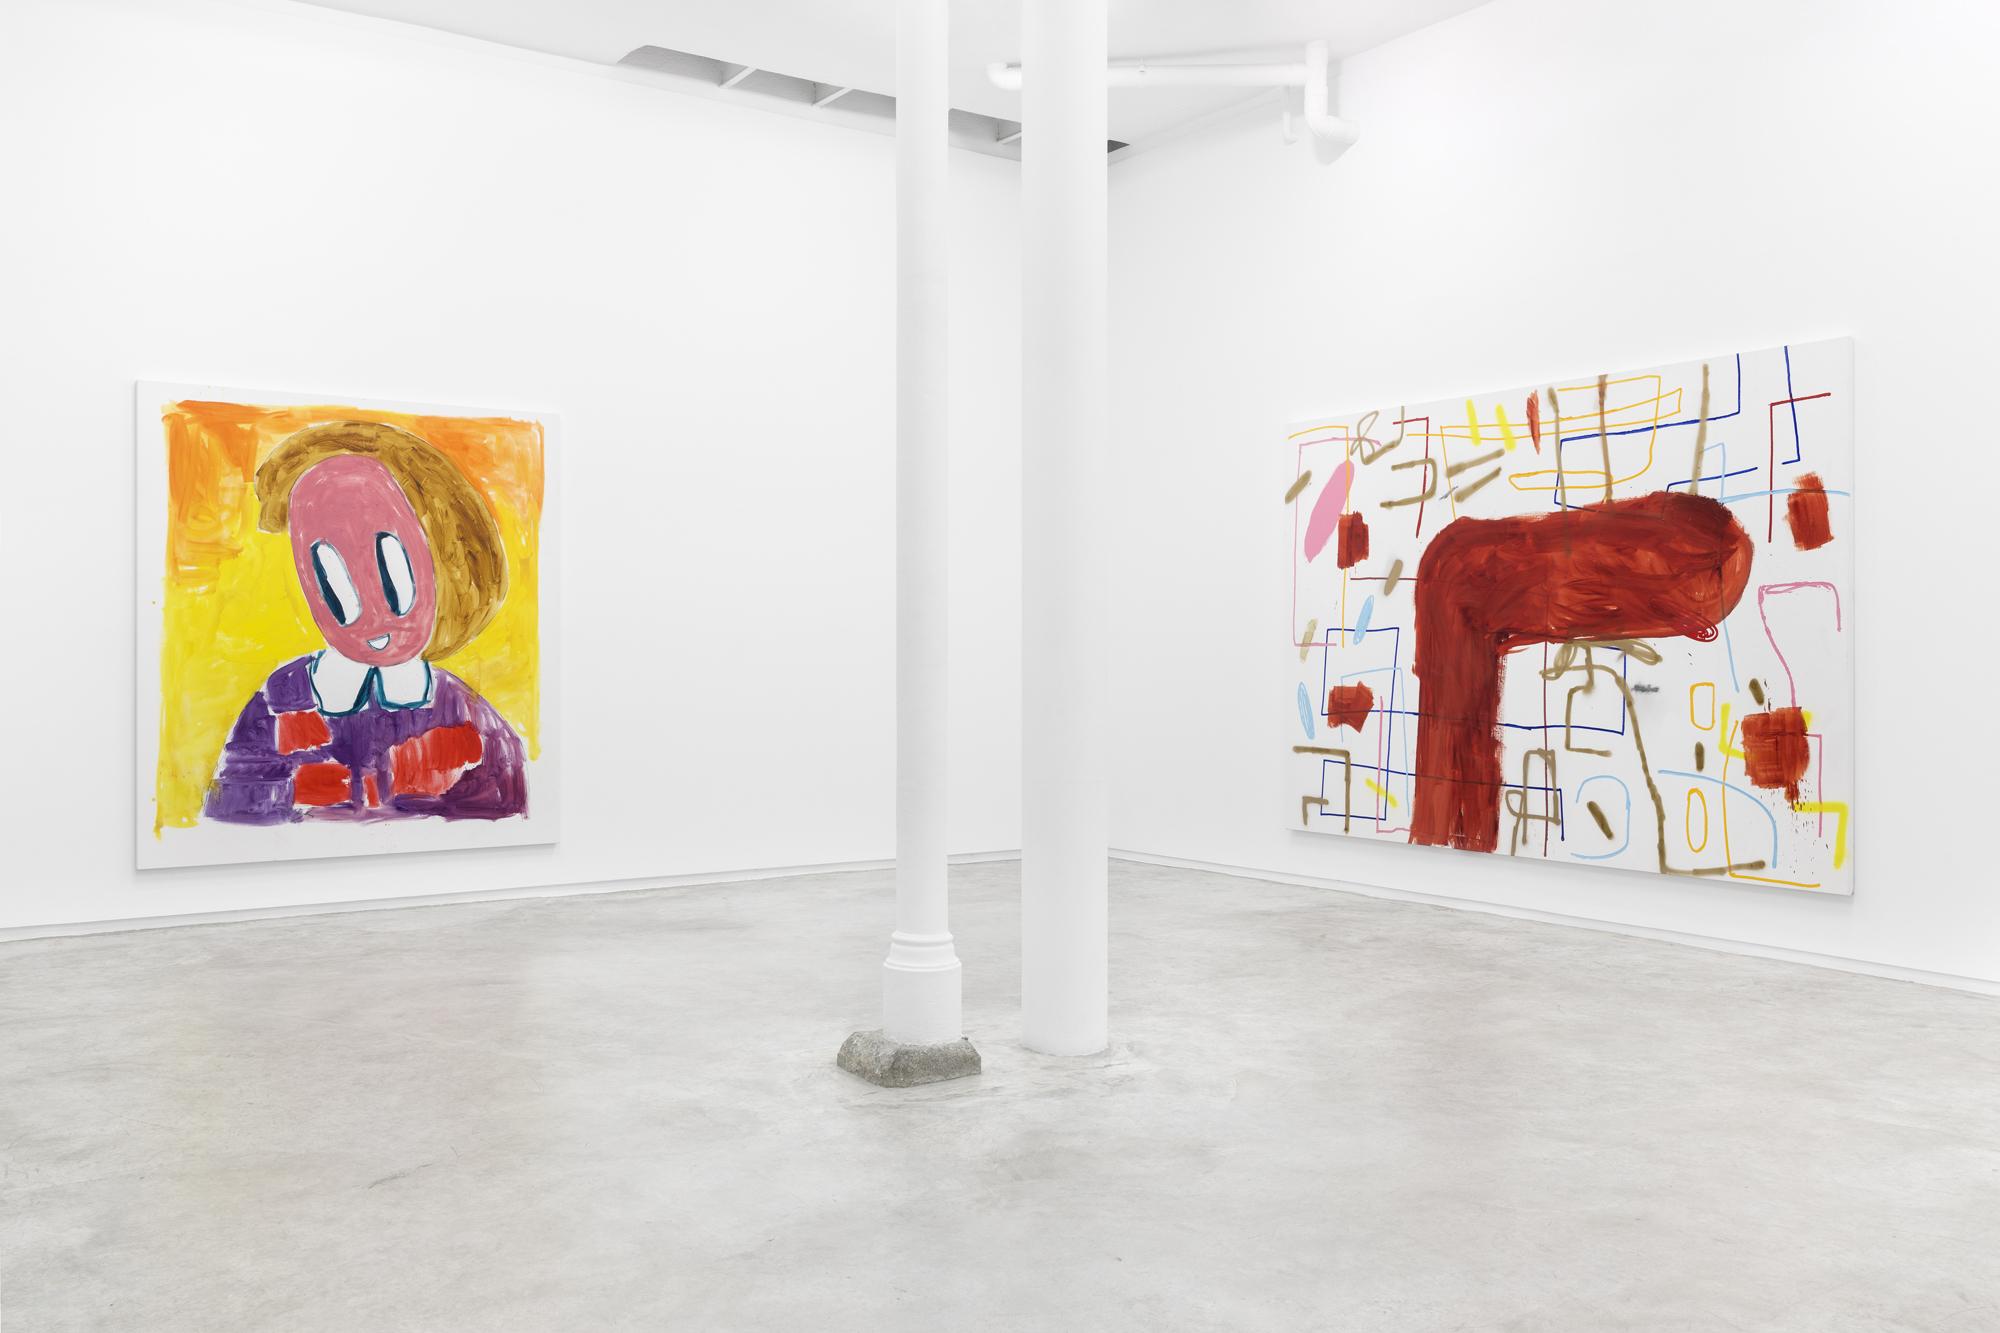 Andre Butzer, Galeria Heinrich Ehrhardt, Madrid